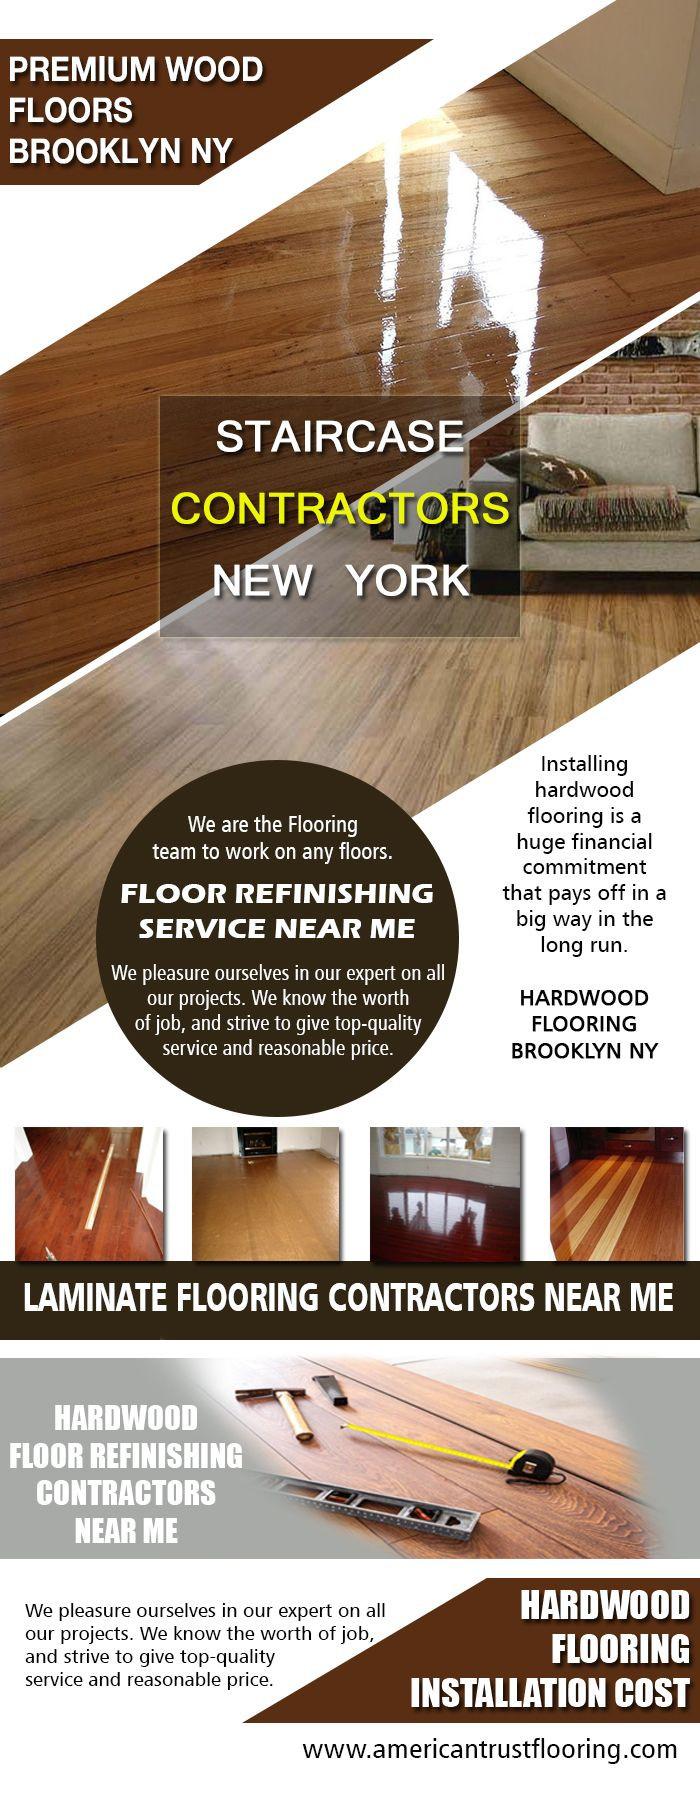 16 Amazing Hardwood Floor Refinishing Vs Resurfacing 2021 free download hardwood floor refinishing vs resurfacing of wood floor nyc hardwood floorny on pinterest pertaining to 84f9e621718657b4146ae4007fb92759